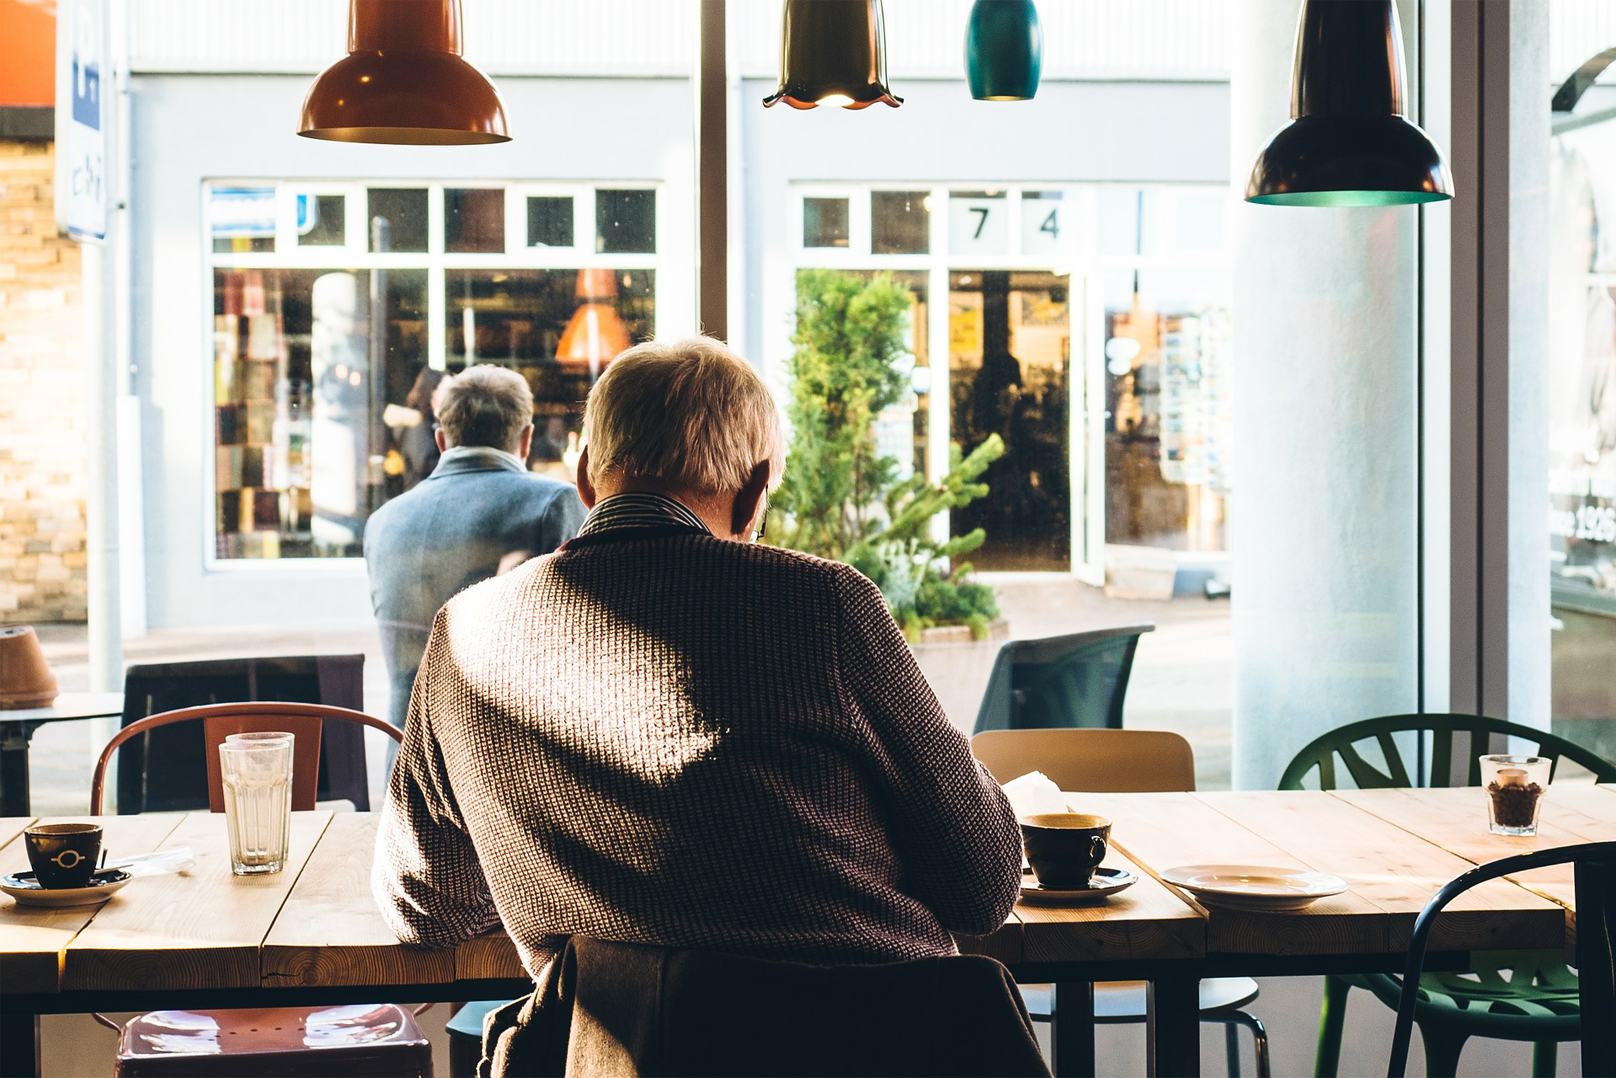 A senior citizen sitting at a coffee shop.